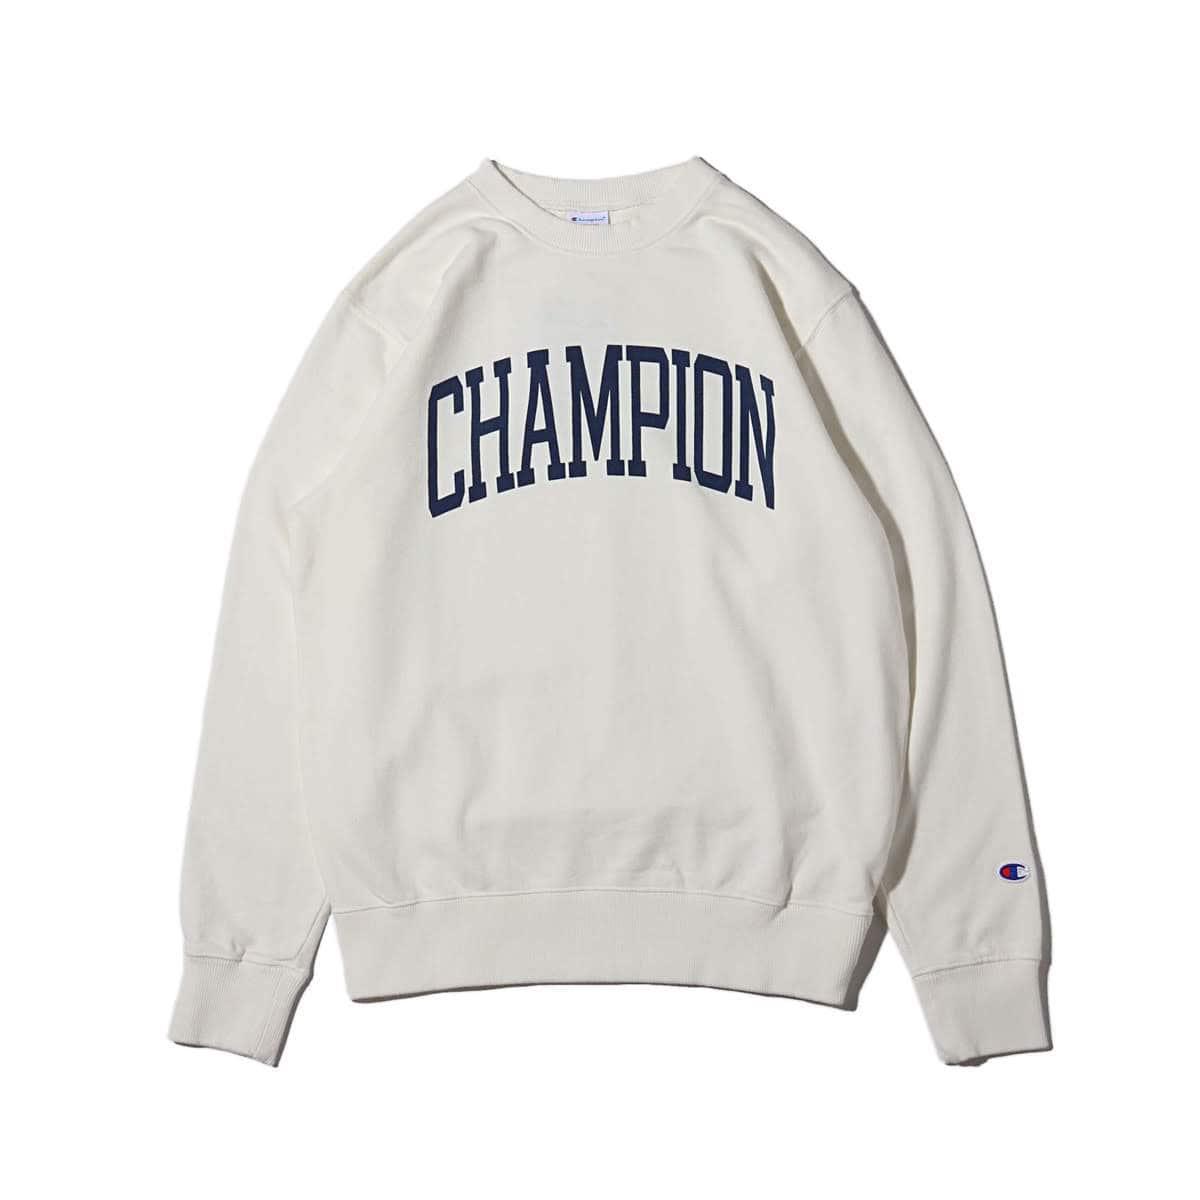 Champion CREW NECK SWEATSHIRT オフホワイト 18FW-I_photo_large